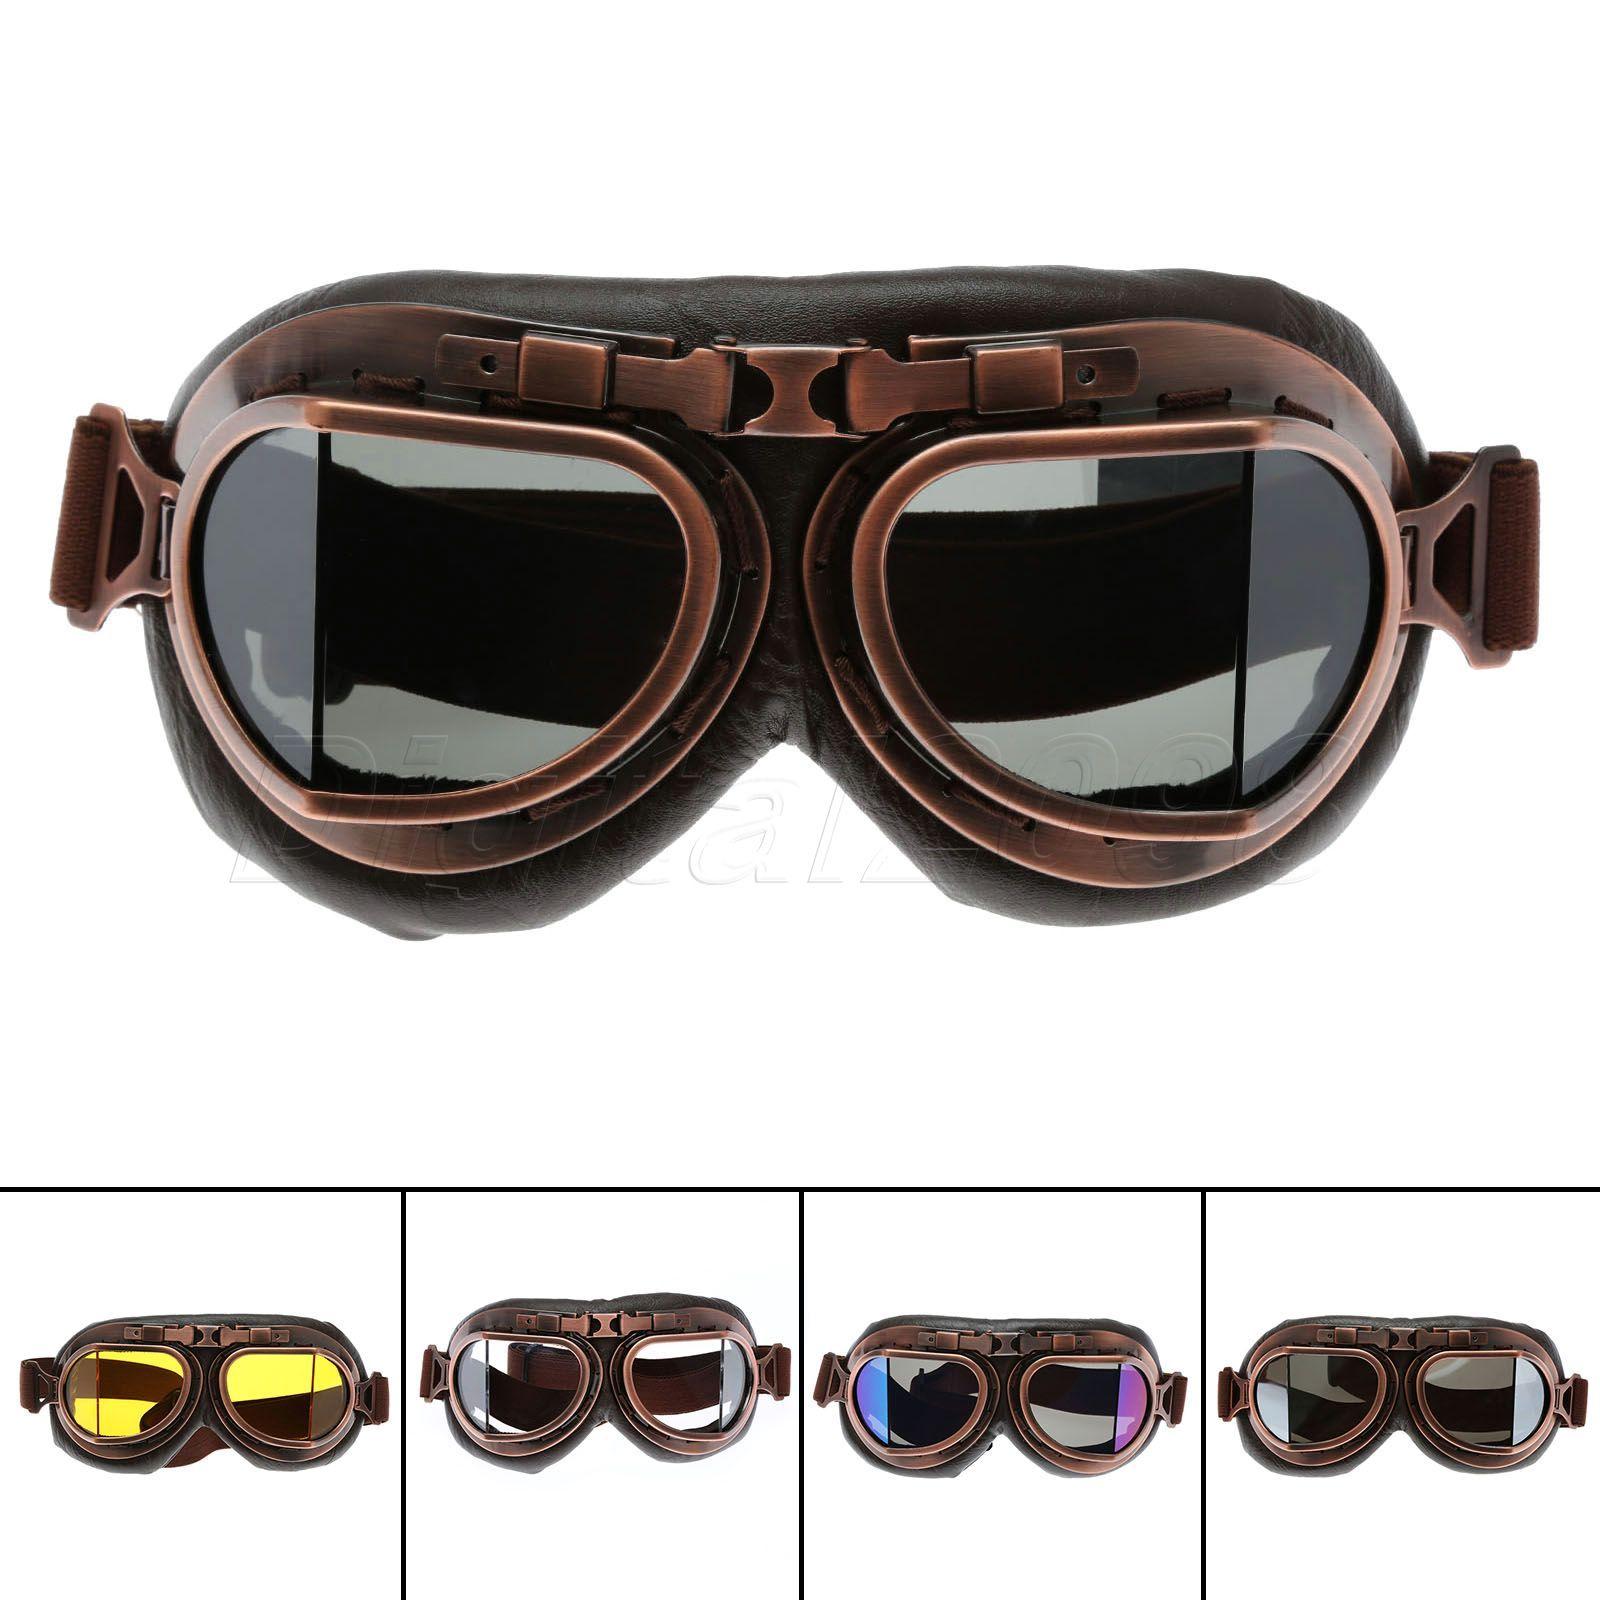 Yetaha WWII RAF Vintage Motorcycle Goggles Harley <font><b>Motocross</b></font> Aviator Pilot Cruiser Glasses ATV Dirt Bike Motor Helmet 5 Colors